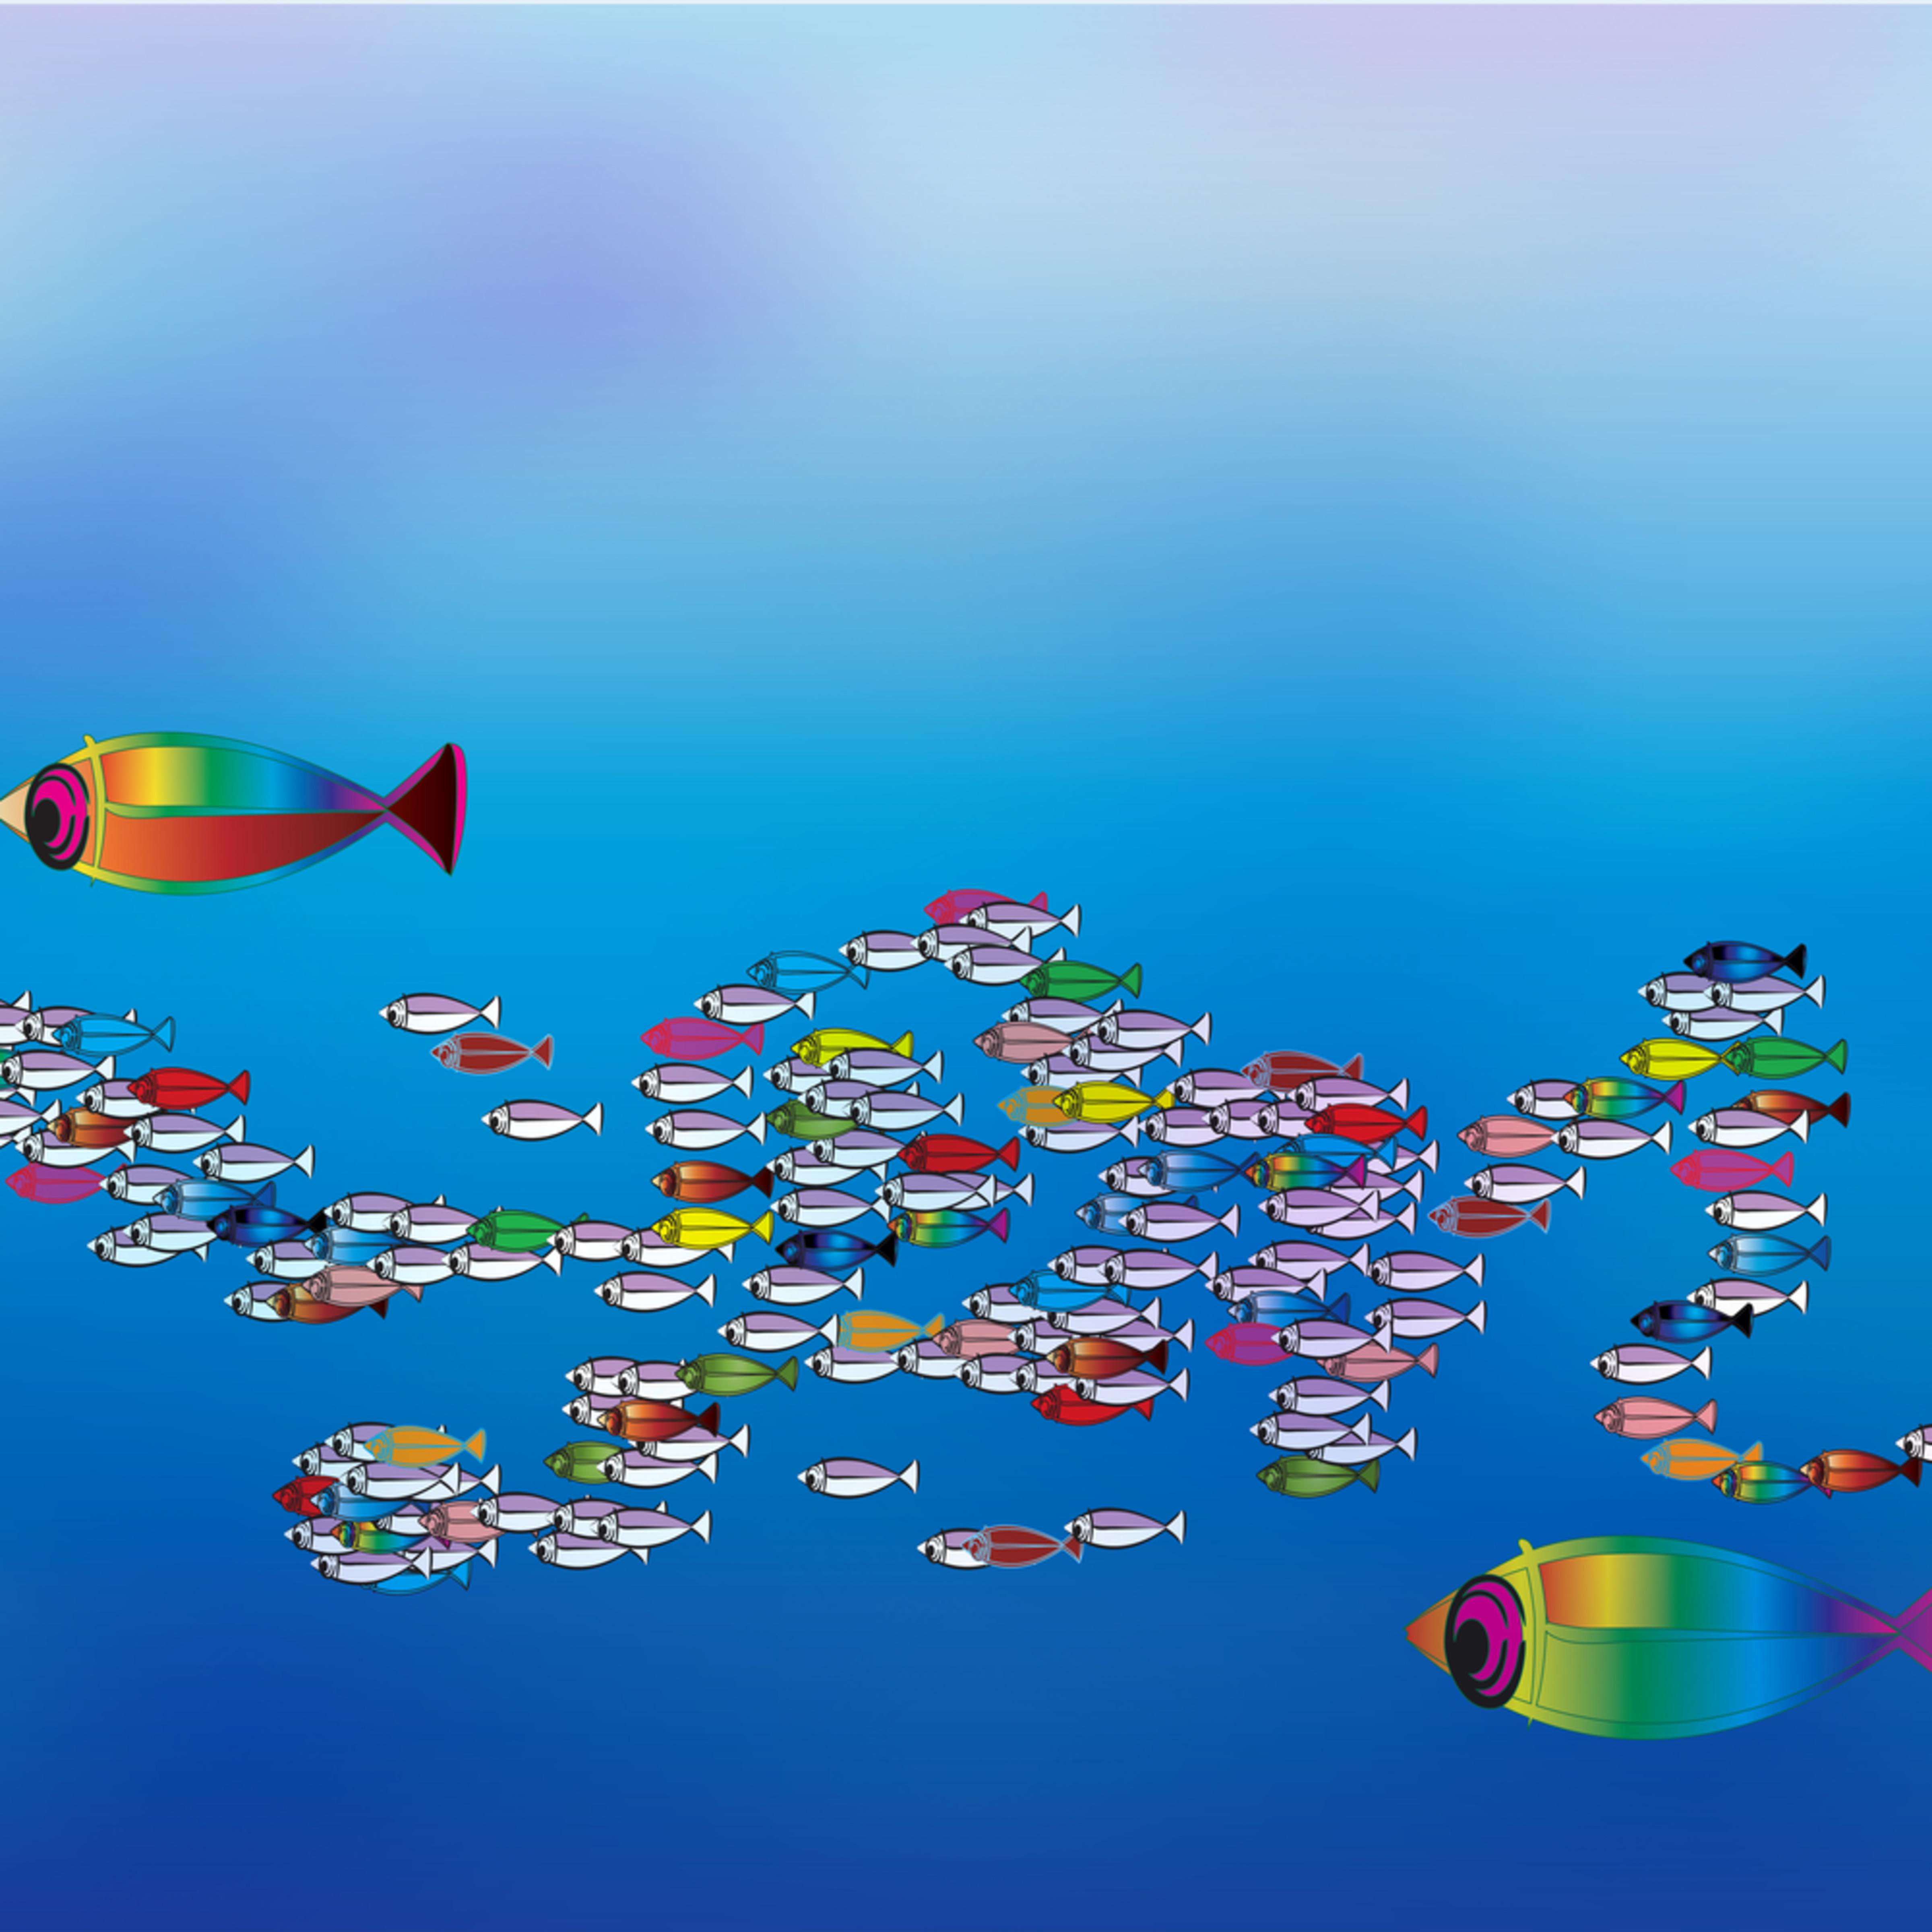 Fish utcj0r